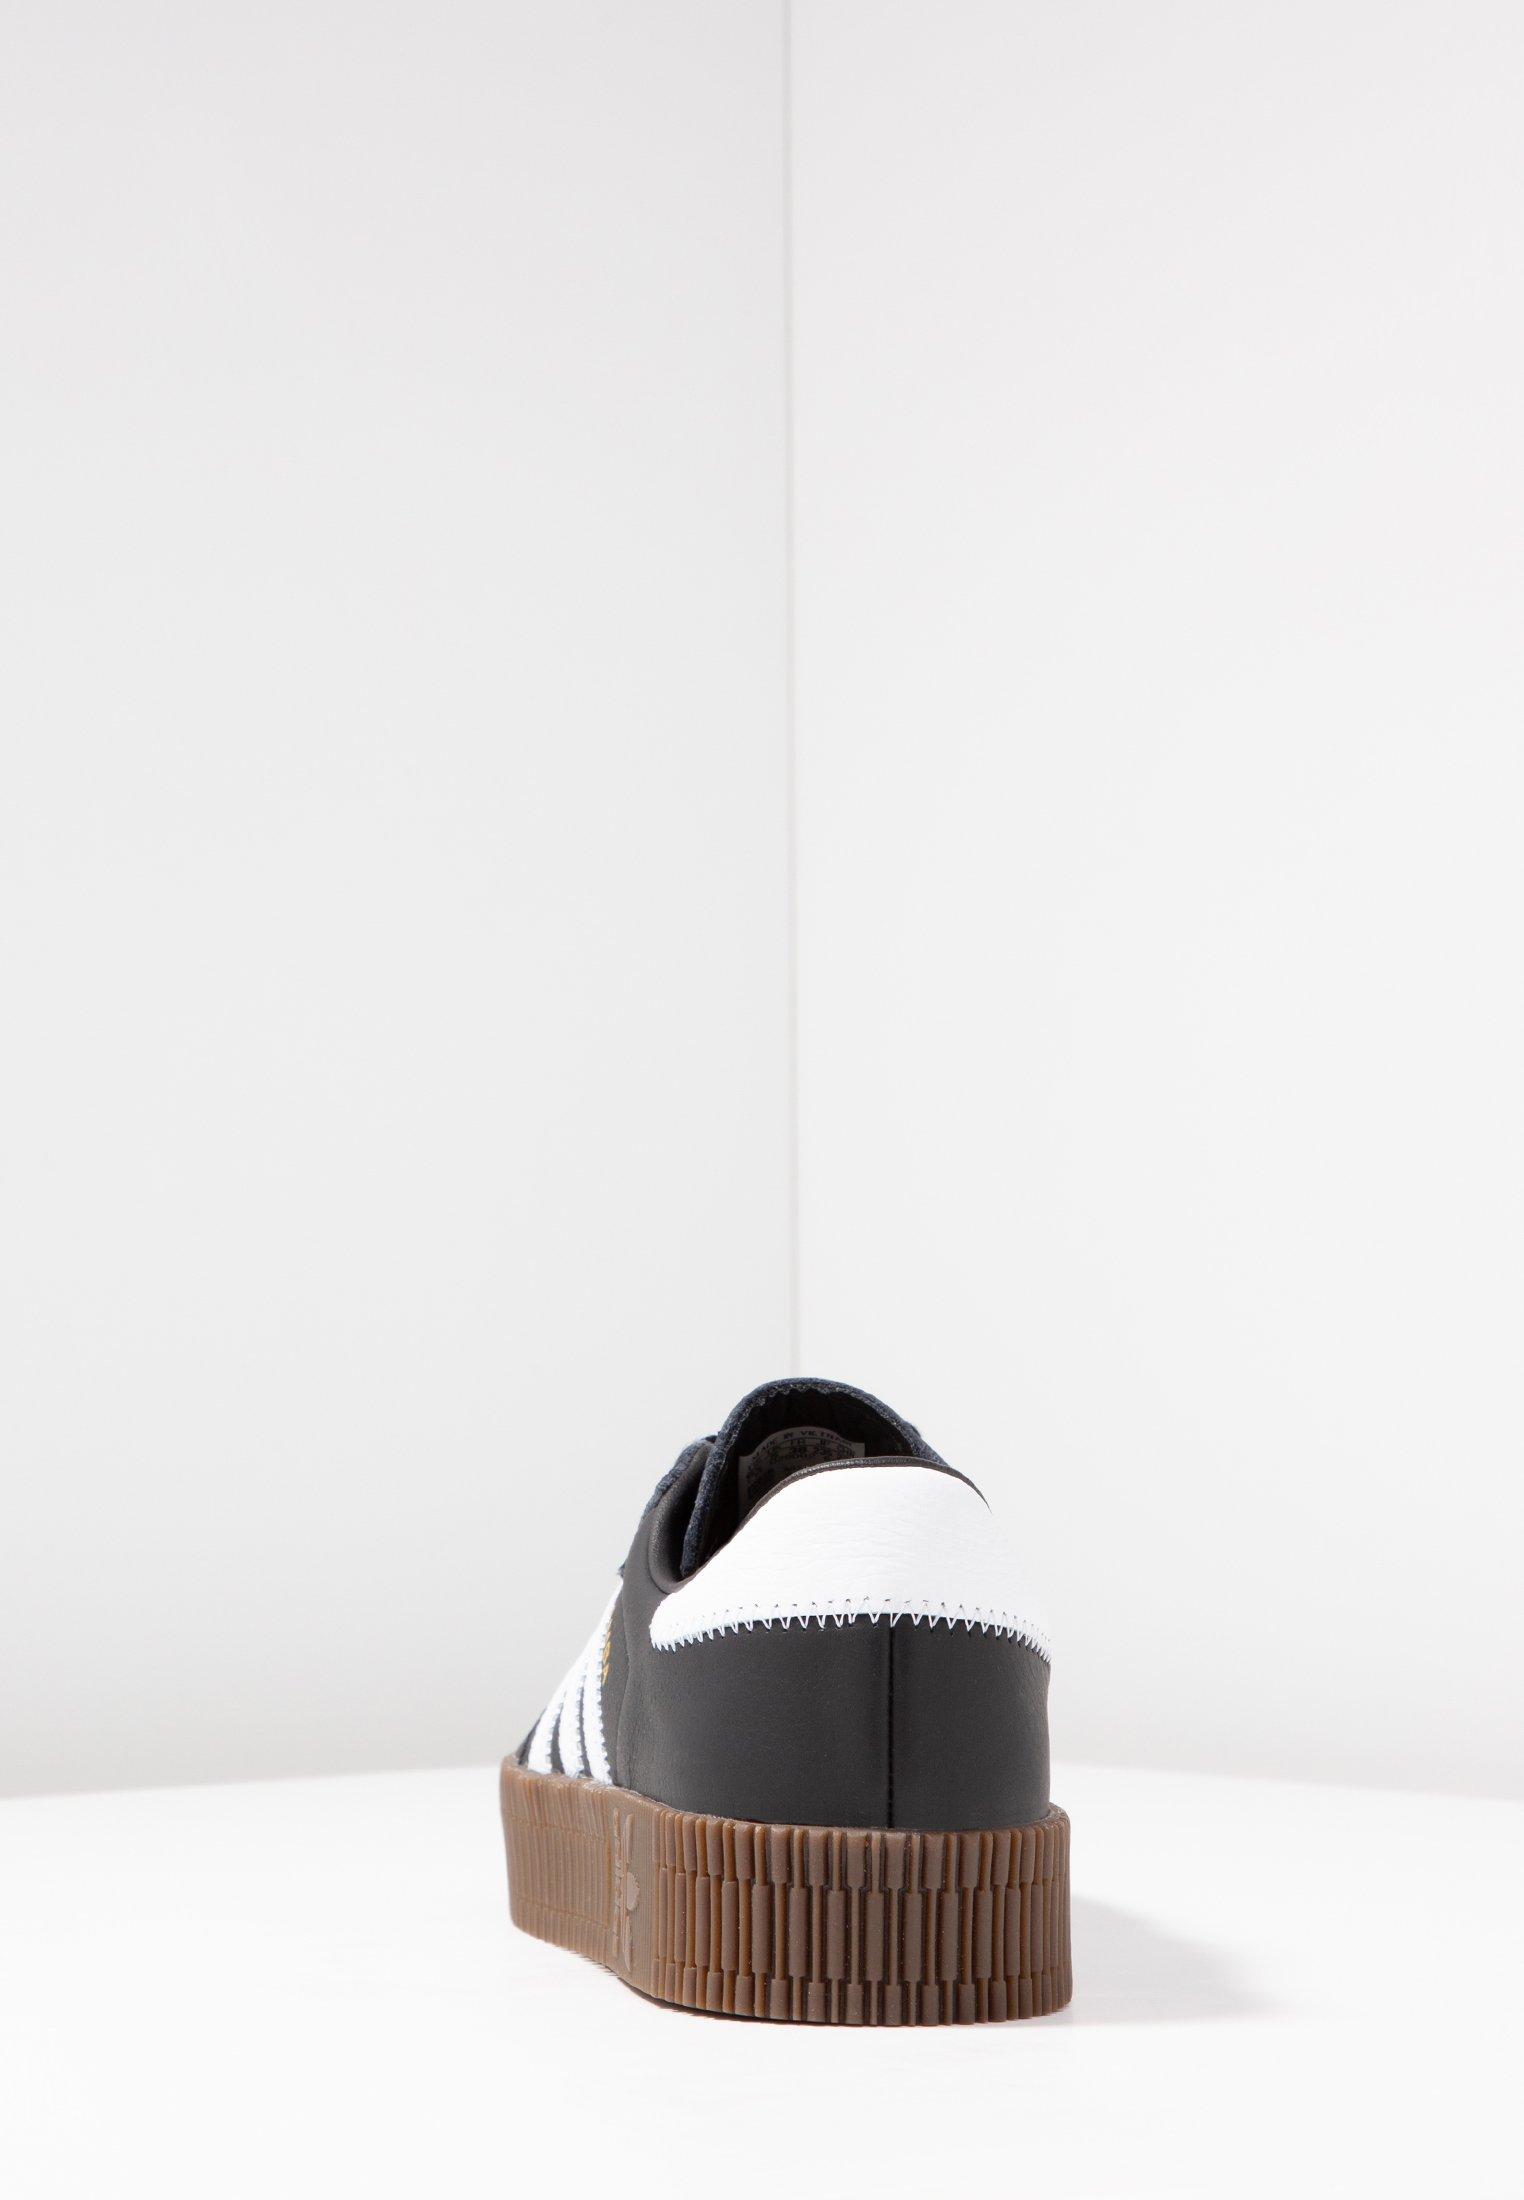 Adidas Originals Sambarose - Baskets Basses Core Black/footwear White nB2nV5Z